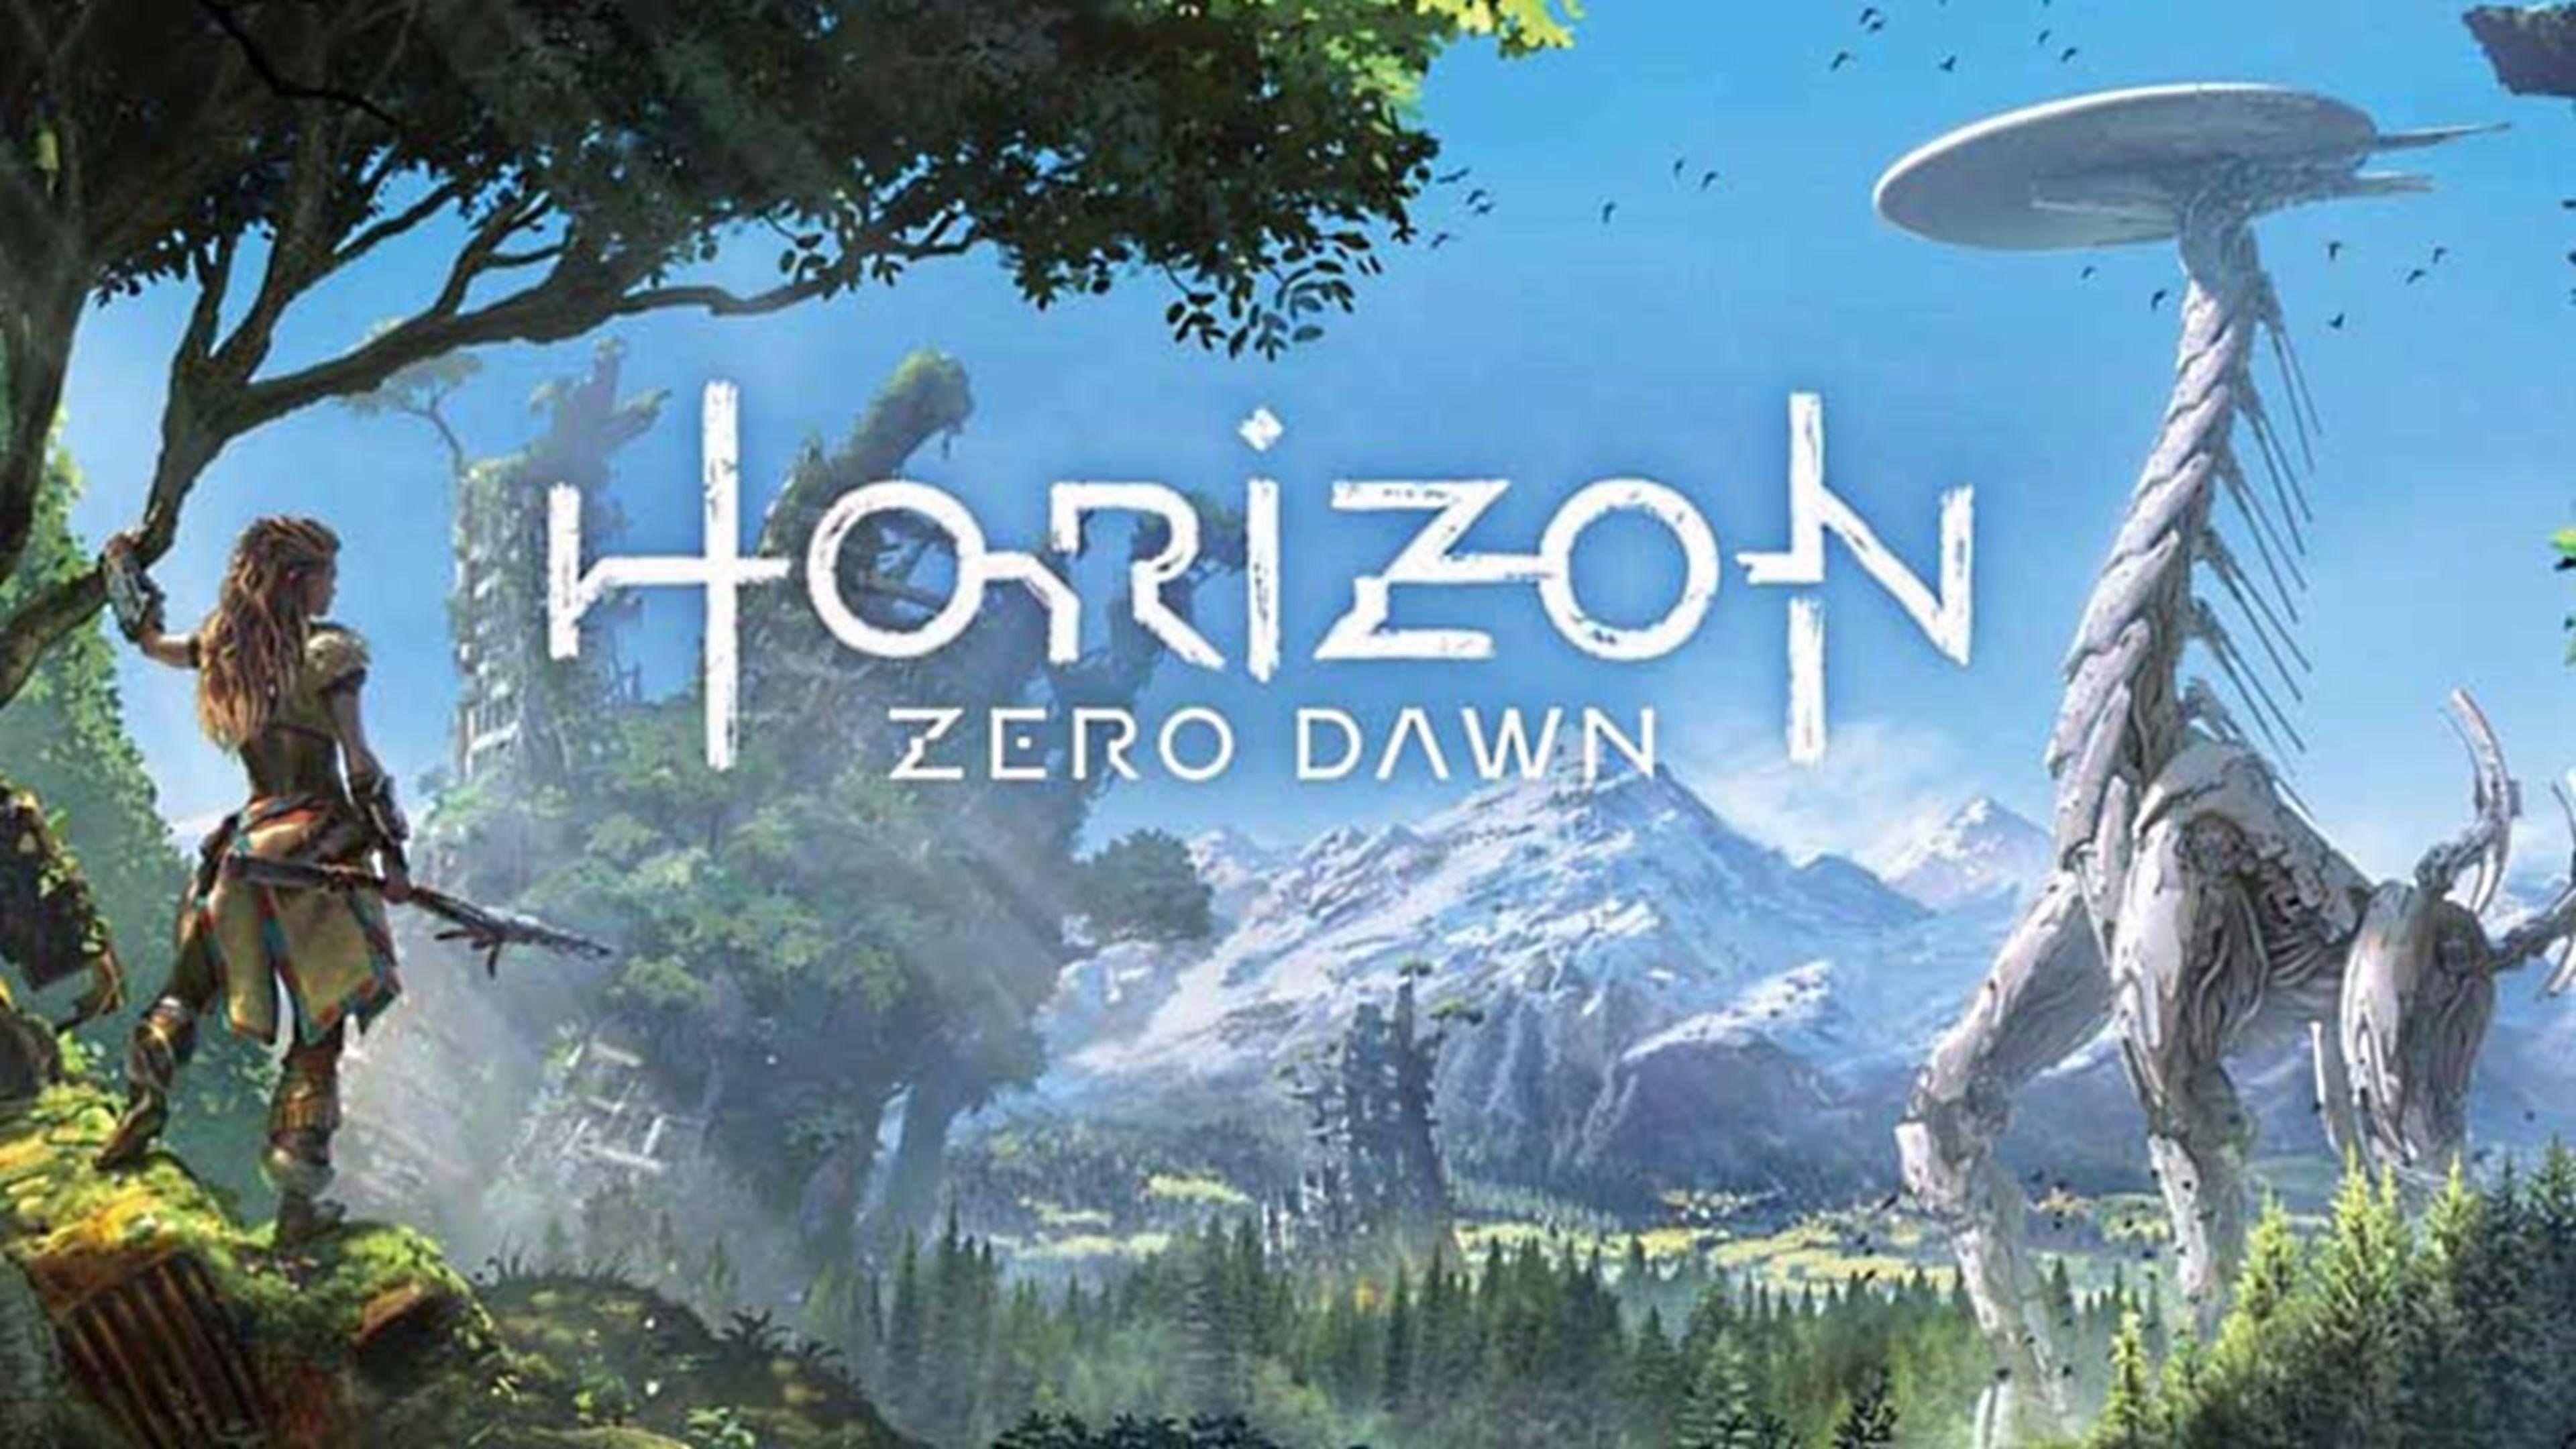 Horizon Zero Dawn Wallpapers Wallpaper Cave